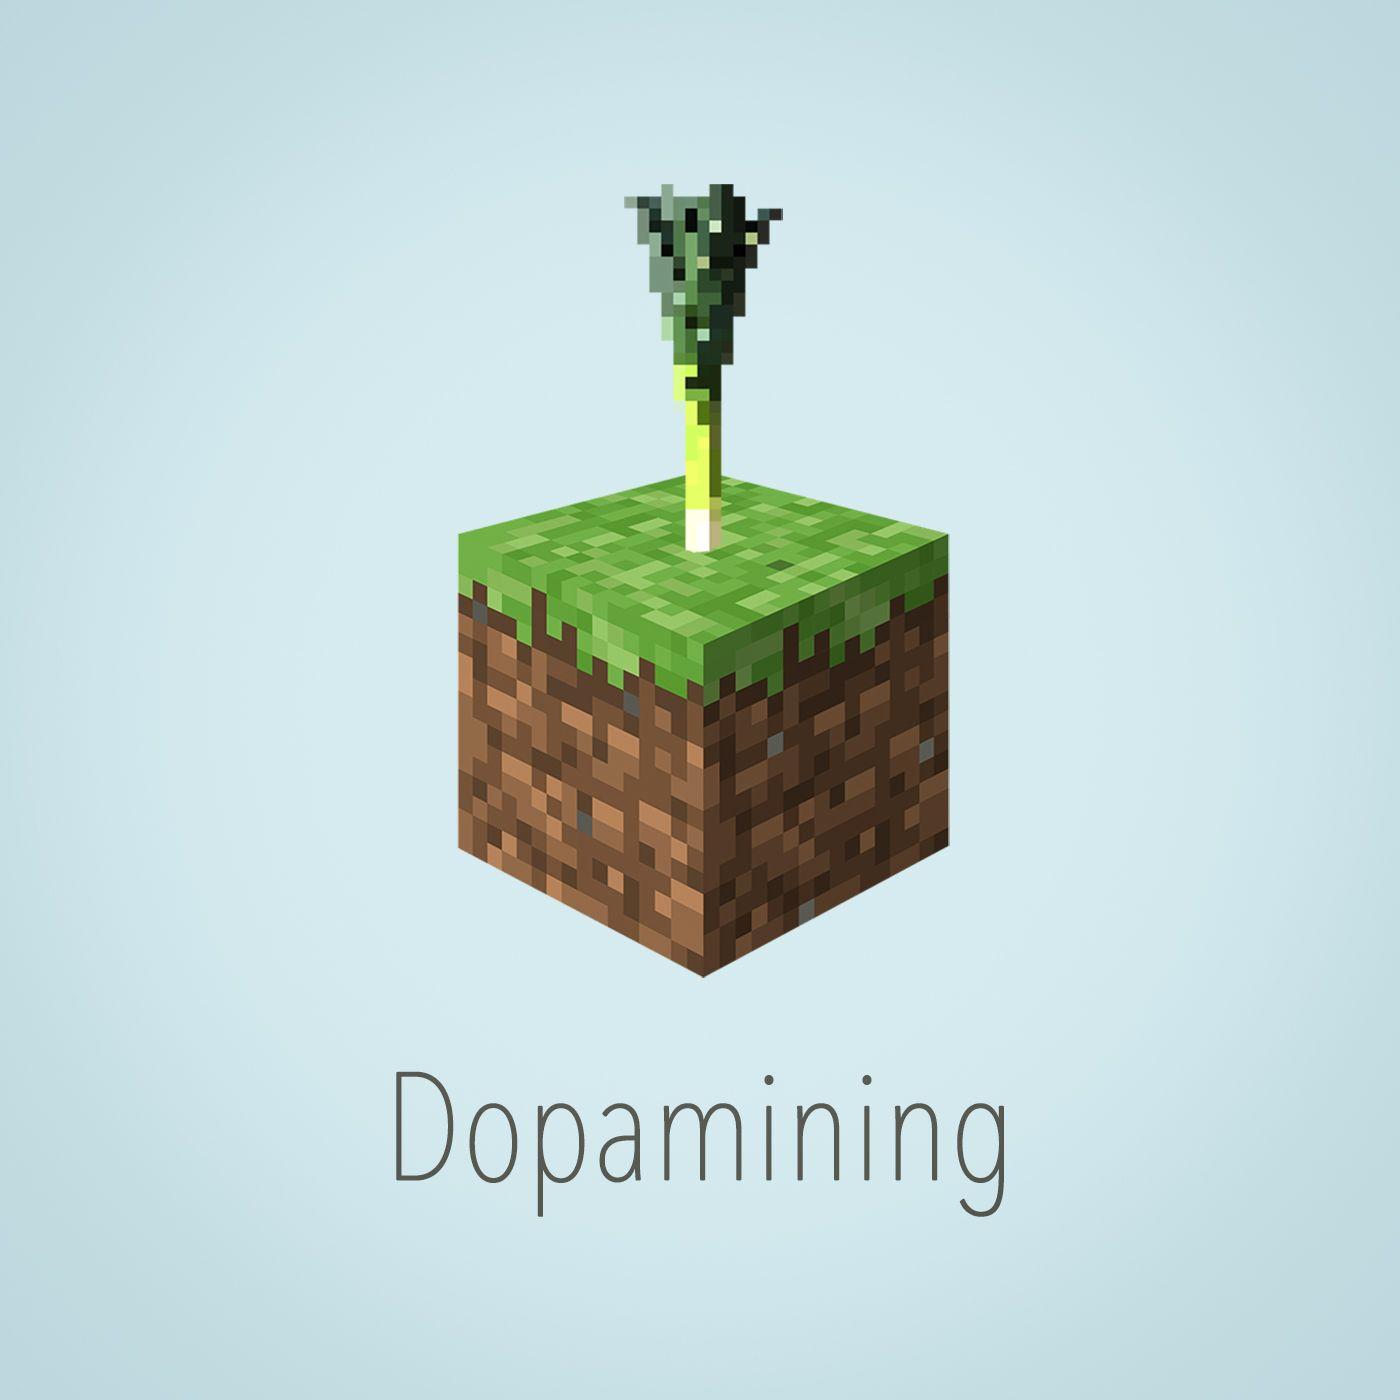 Dopamining